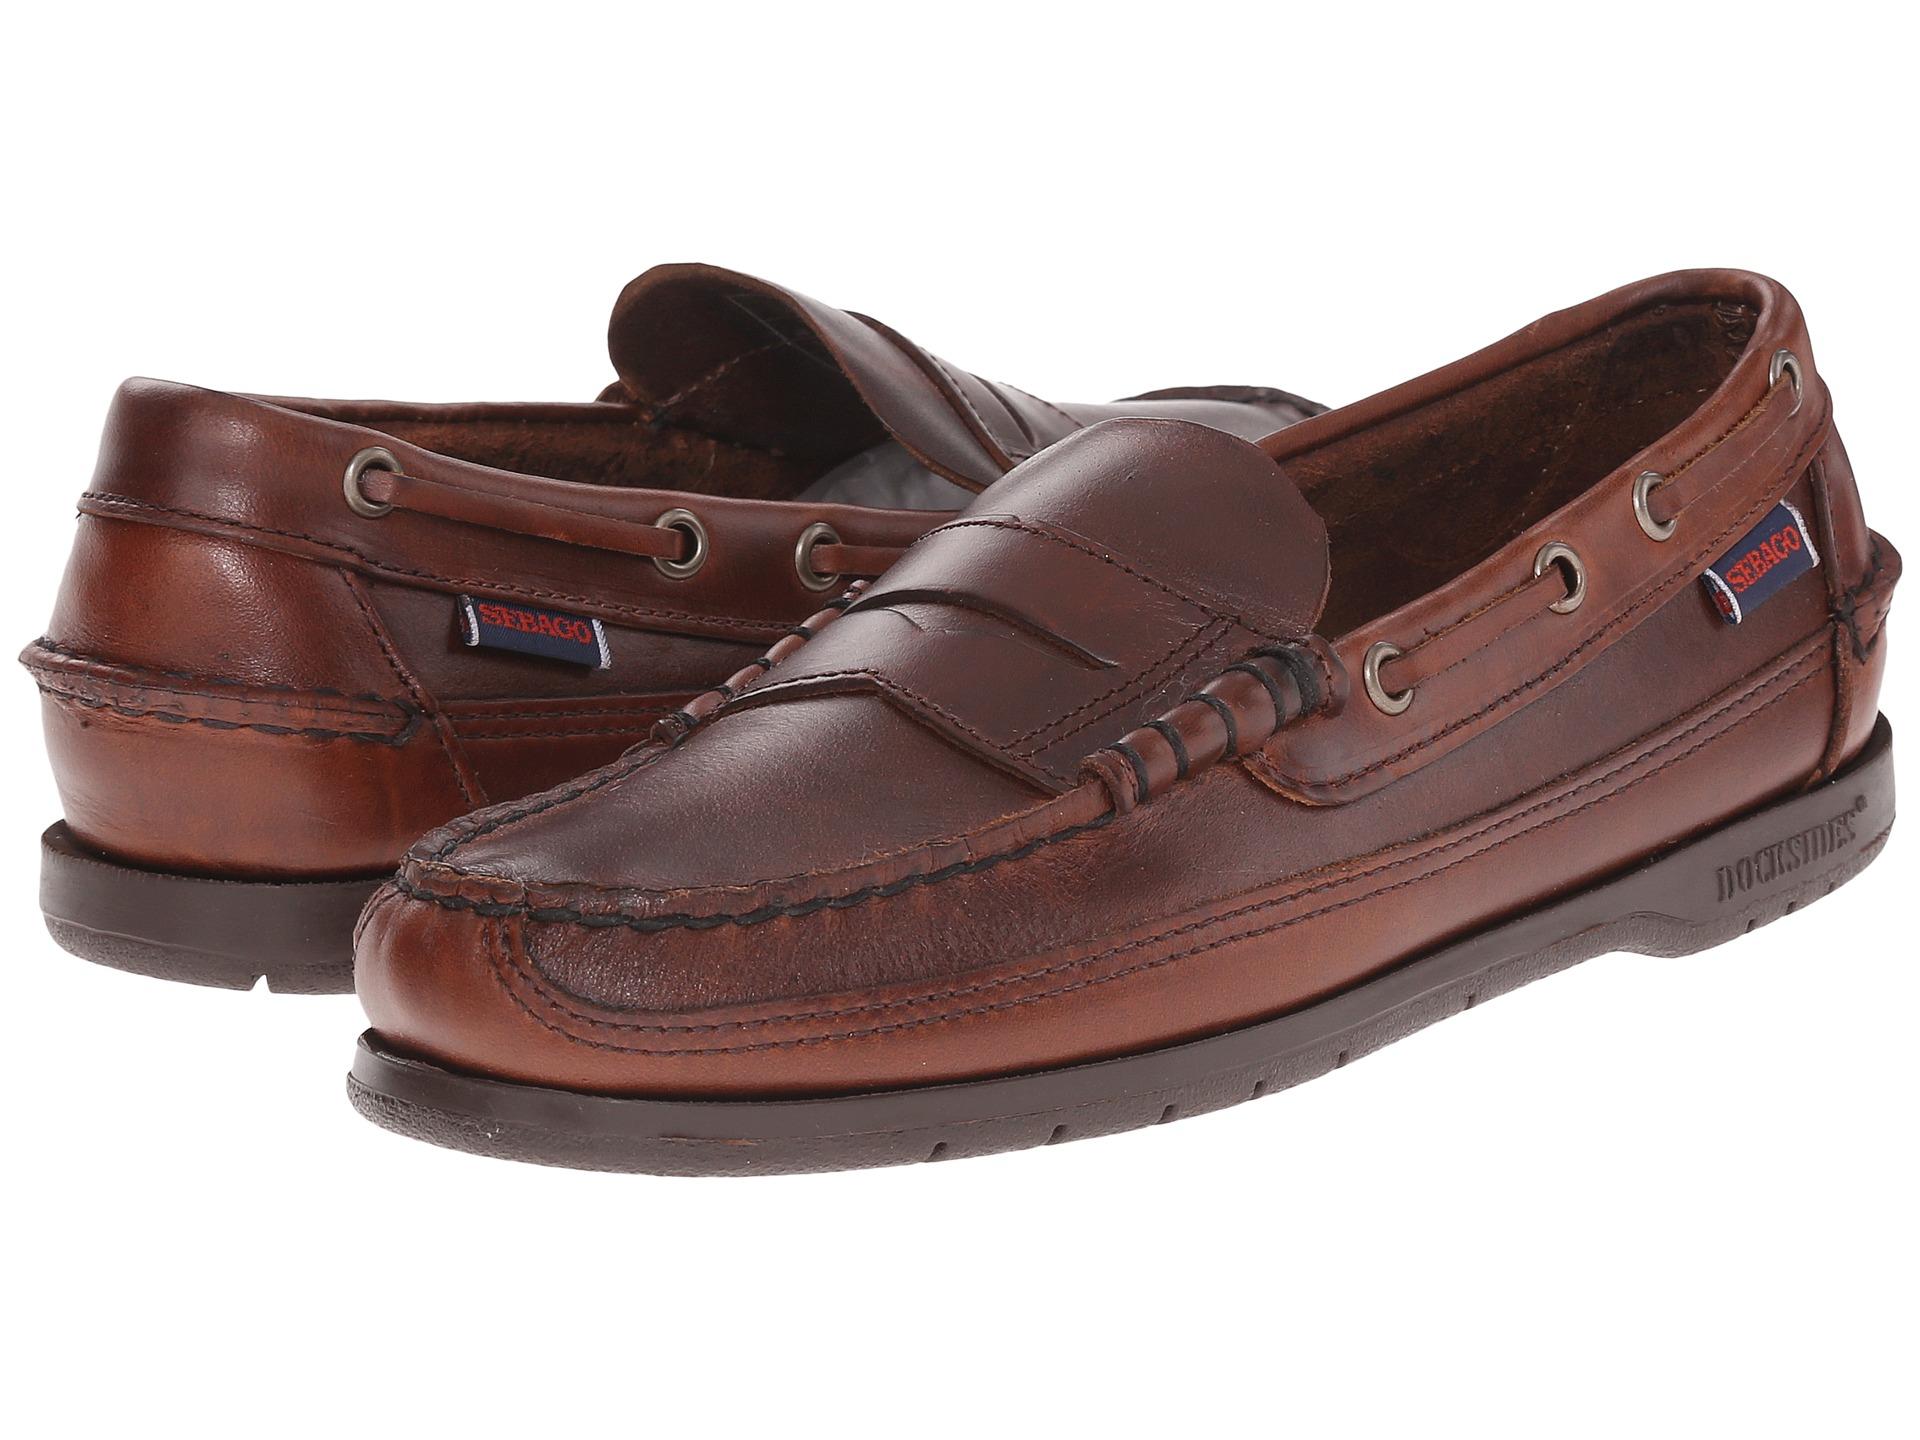 Sebago Shoes Size Chart